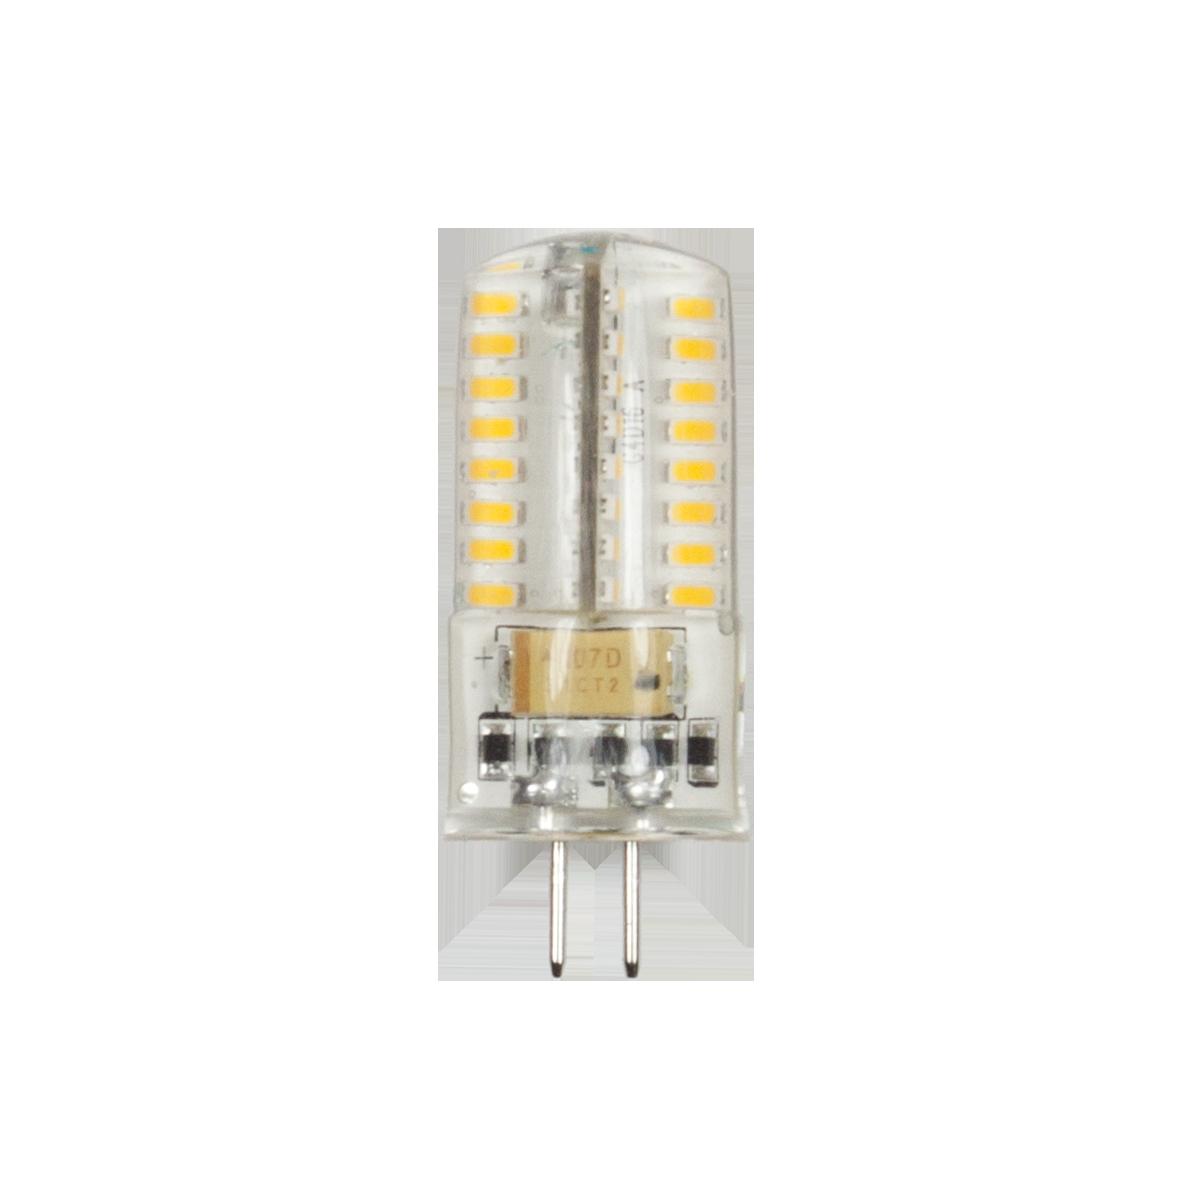 G4 ECOSTAR  Wattage: 2, 3 Lumens: 150, 240